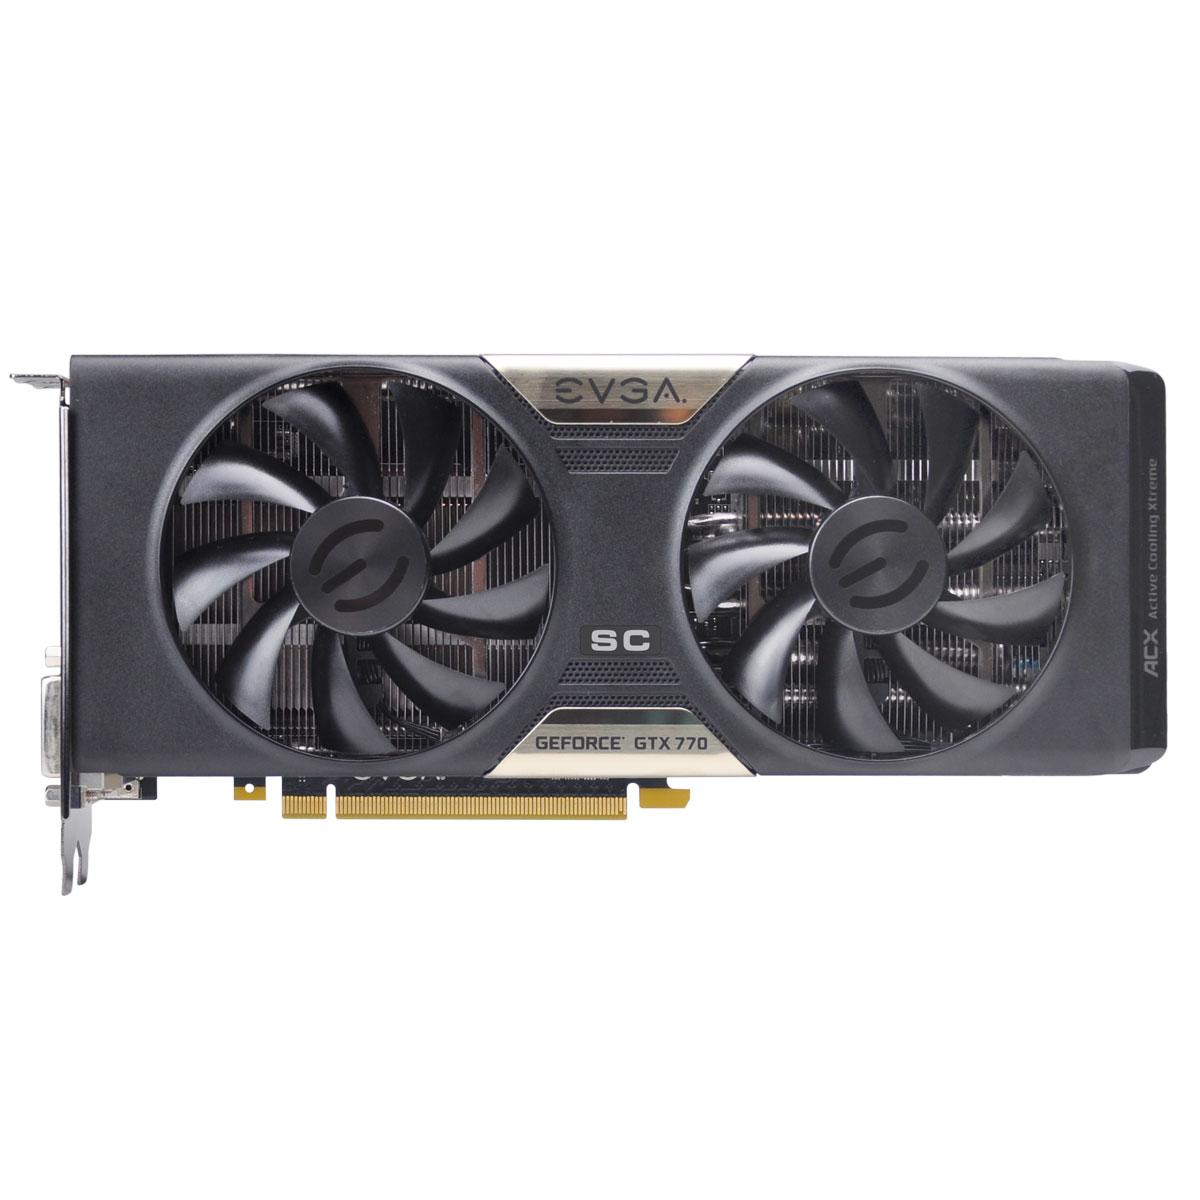 Placa de Video GeForce GTX770 2GB DDR5 256Bits Superclocked 02G-P4-2776-KR - EVGA